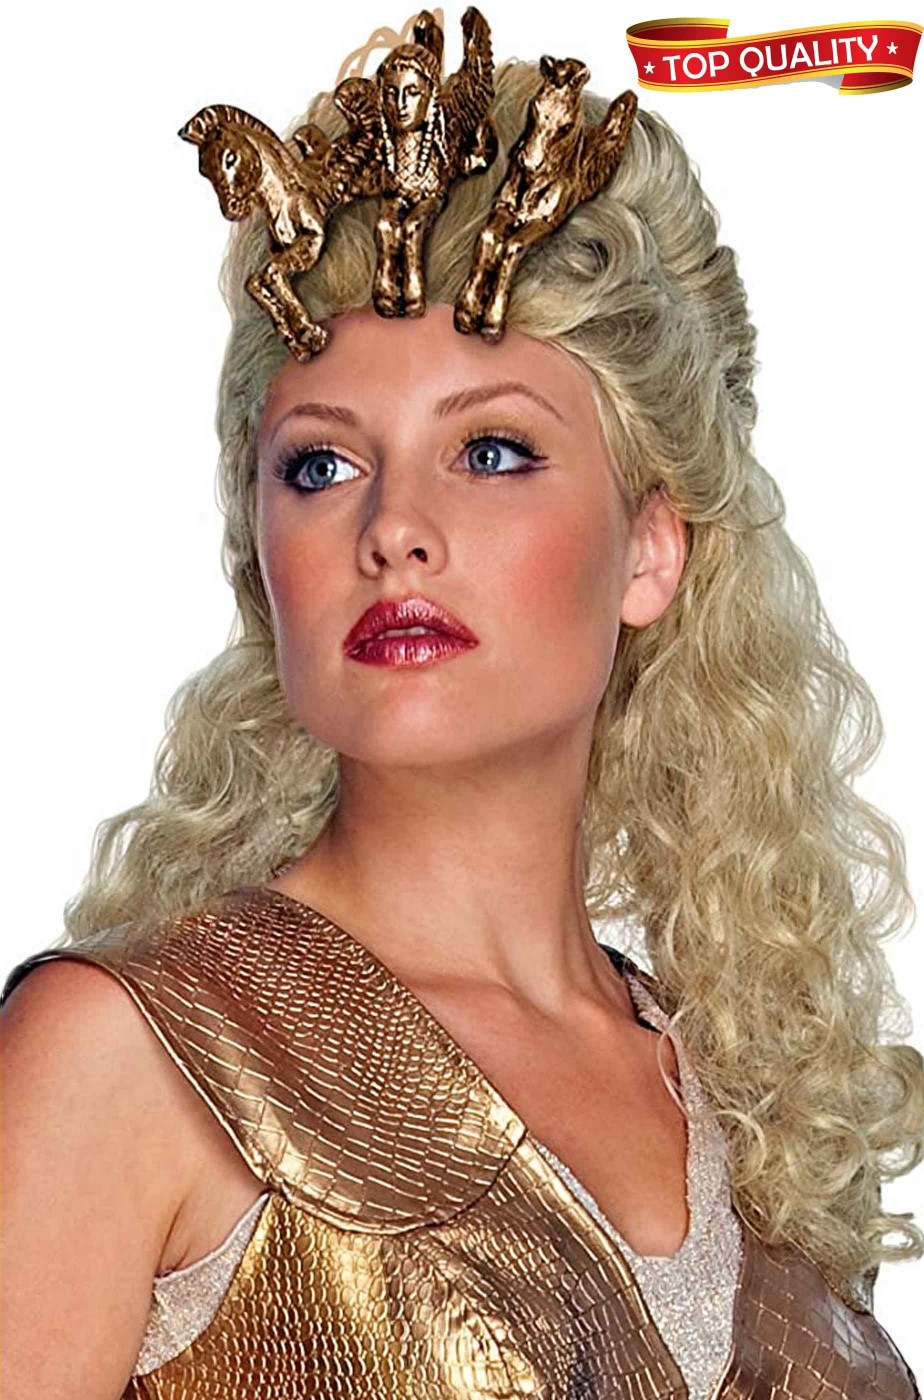 Parrucca bionda con cavalli alati da Athena dea greca alta qualita'